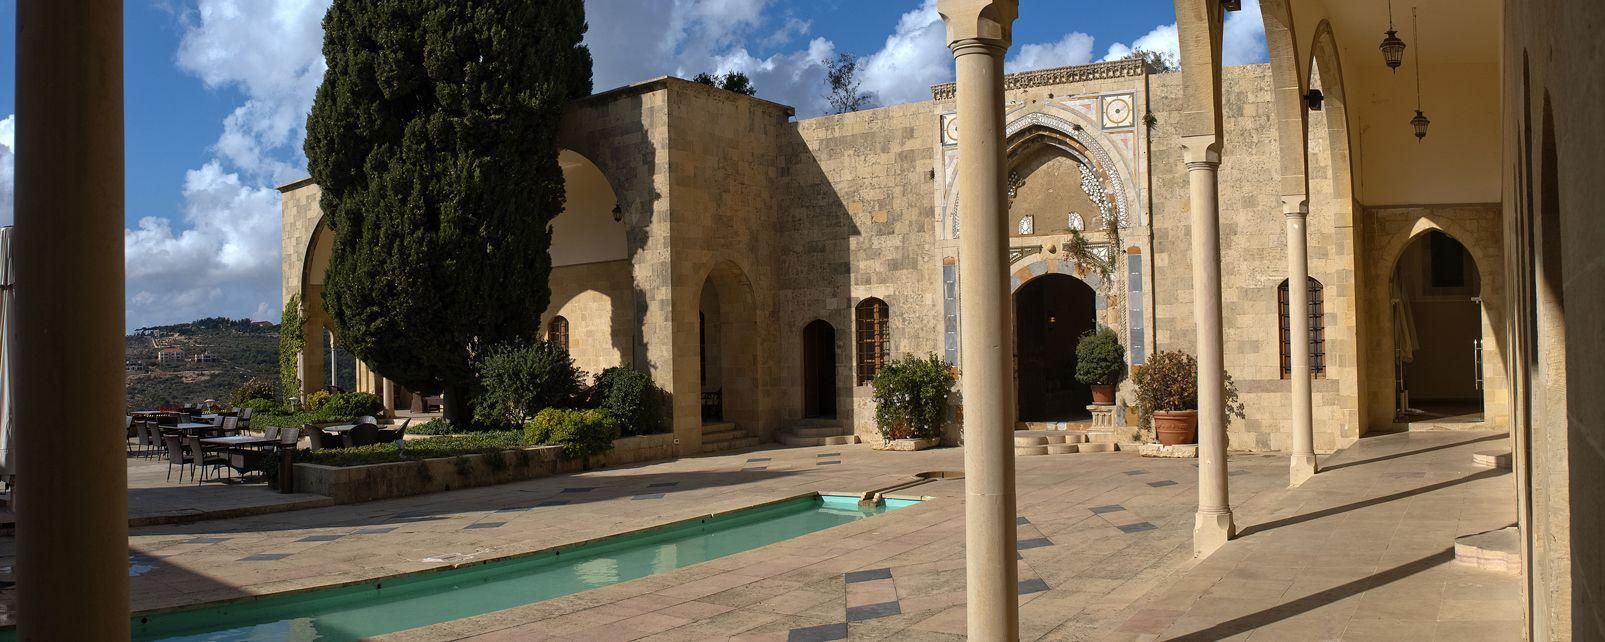 Hôtel Mir Amin Palace